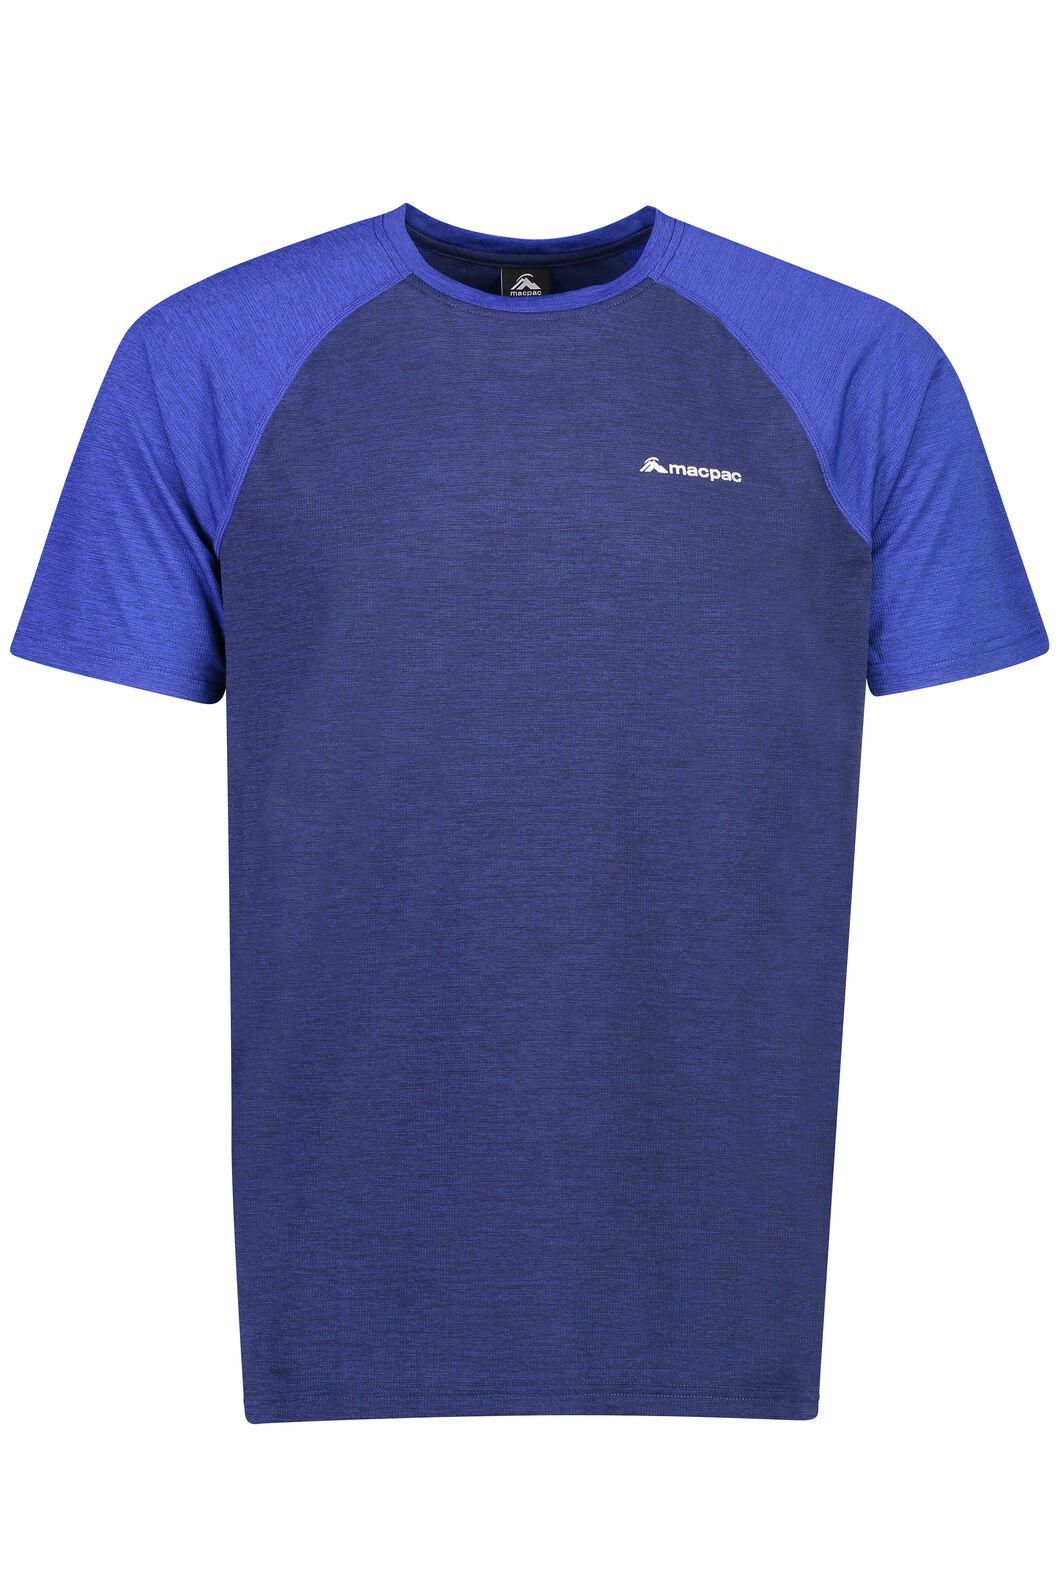 Macpac Take a Hike Short Sleeve Top - Men's, Medieval Blue, hi-res